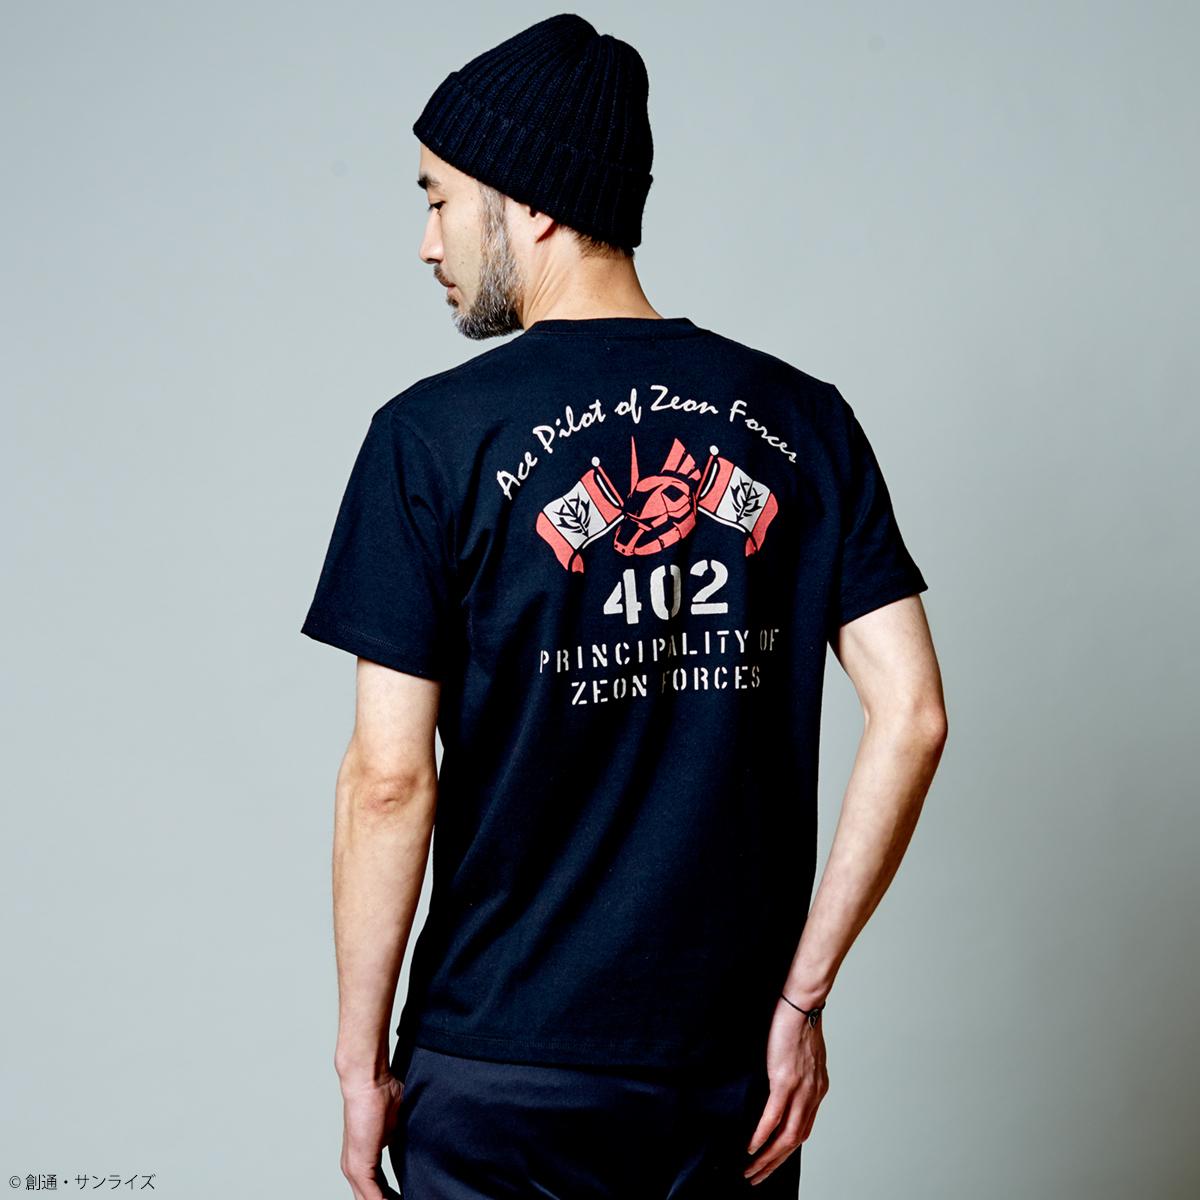 STRICT-G.ARMS『機動戦士ガンダム』 Tシャツ 深紅の稲妻